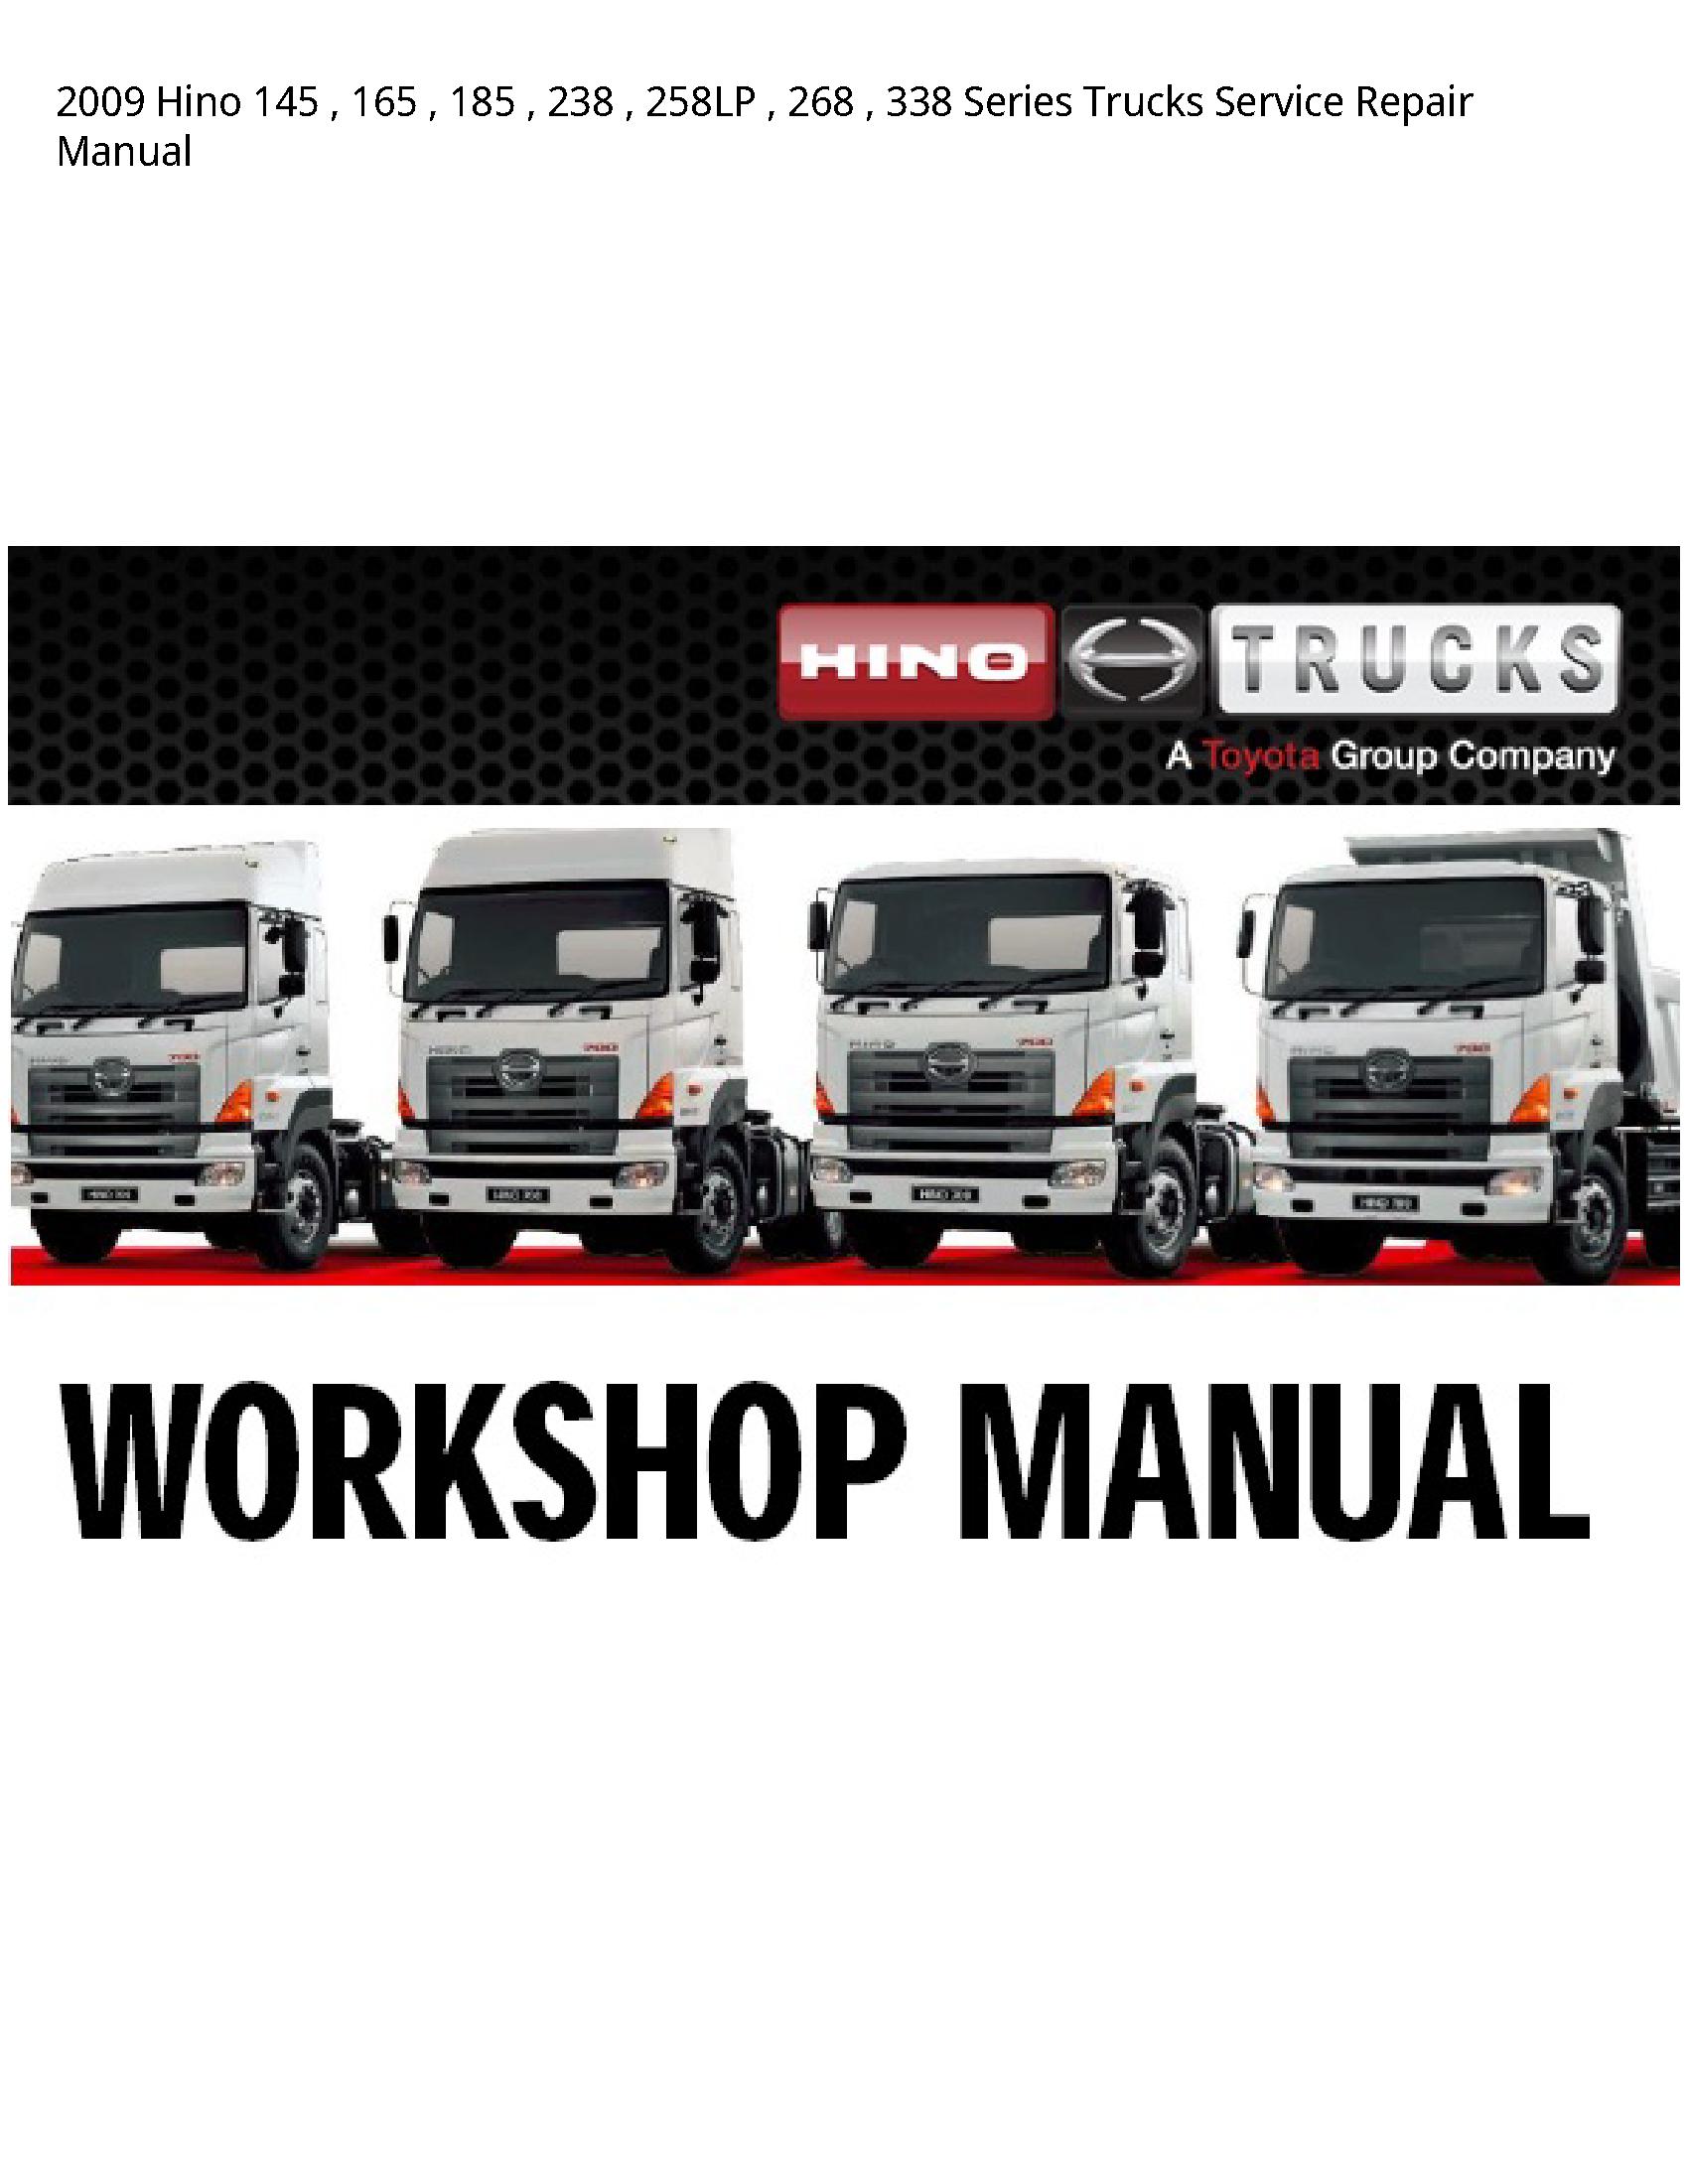 Hino 145 Series Trucks manual